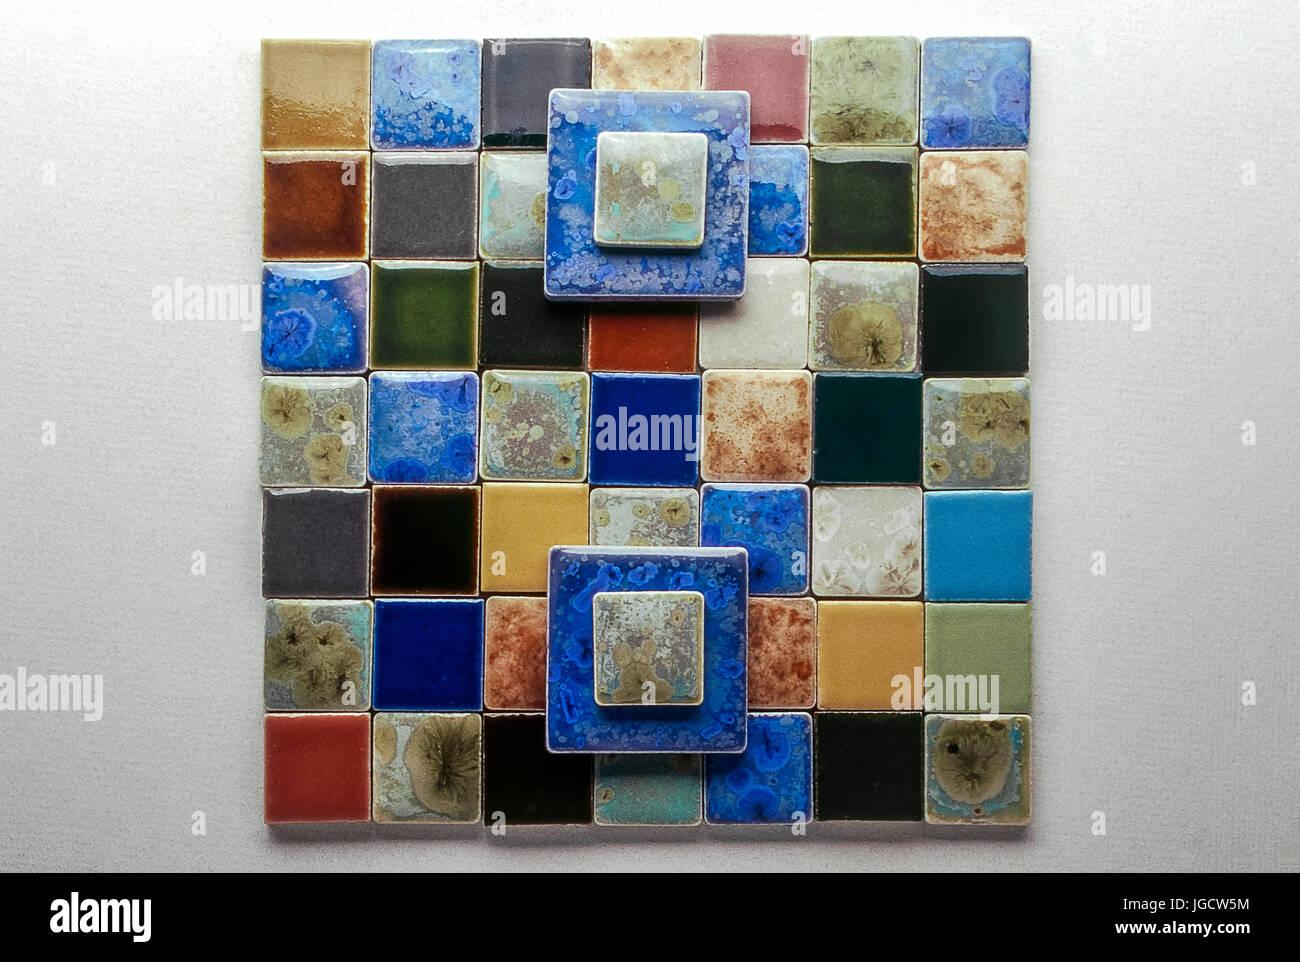 Porcelain Tiles Stockfotos & Porcelain Tiles Bilder - Seite 2 - Alamy